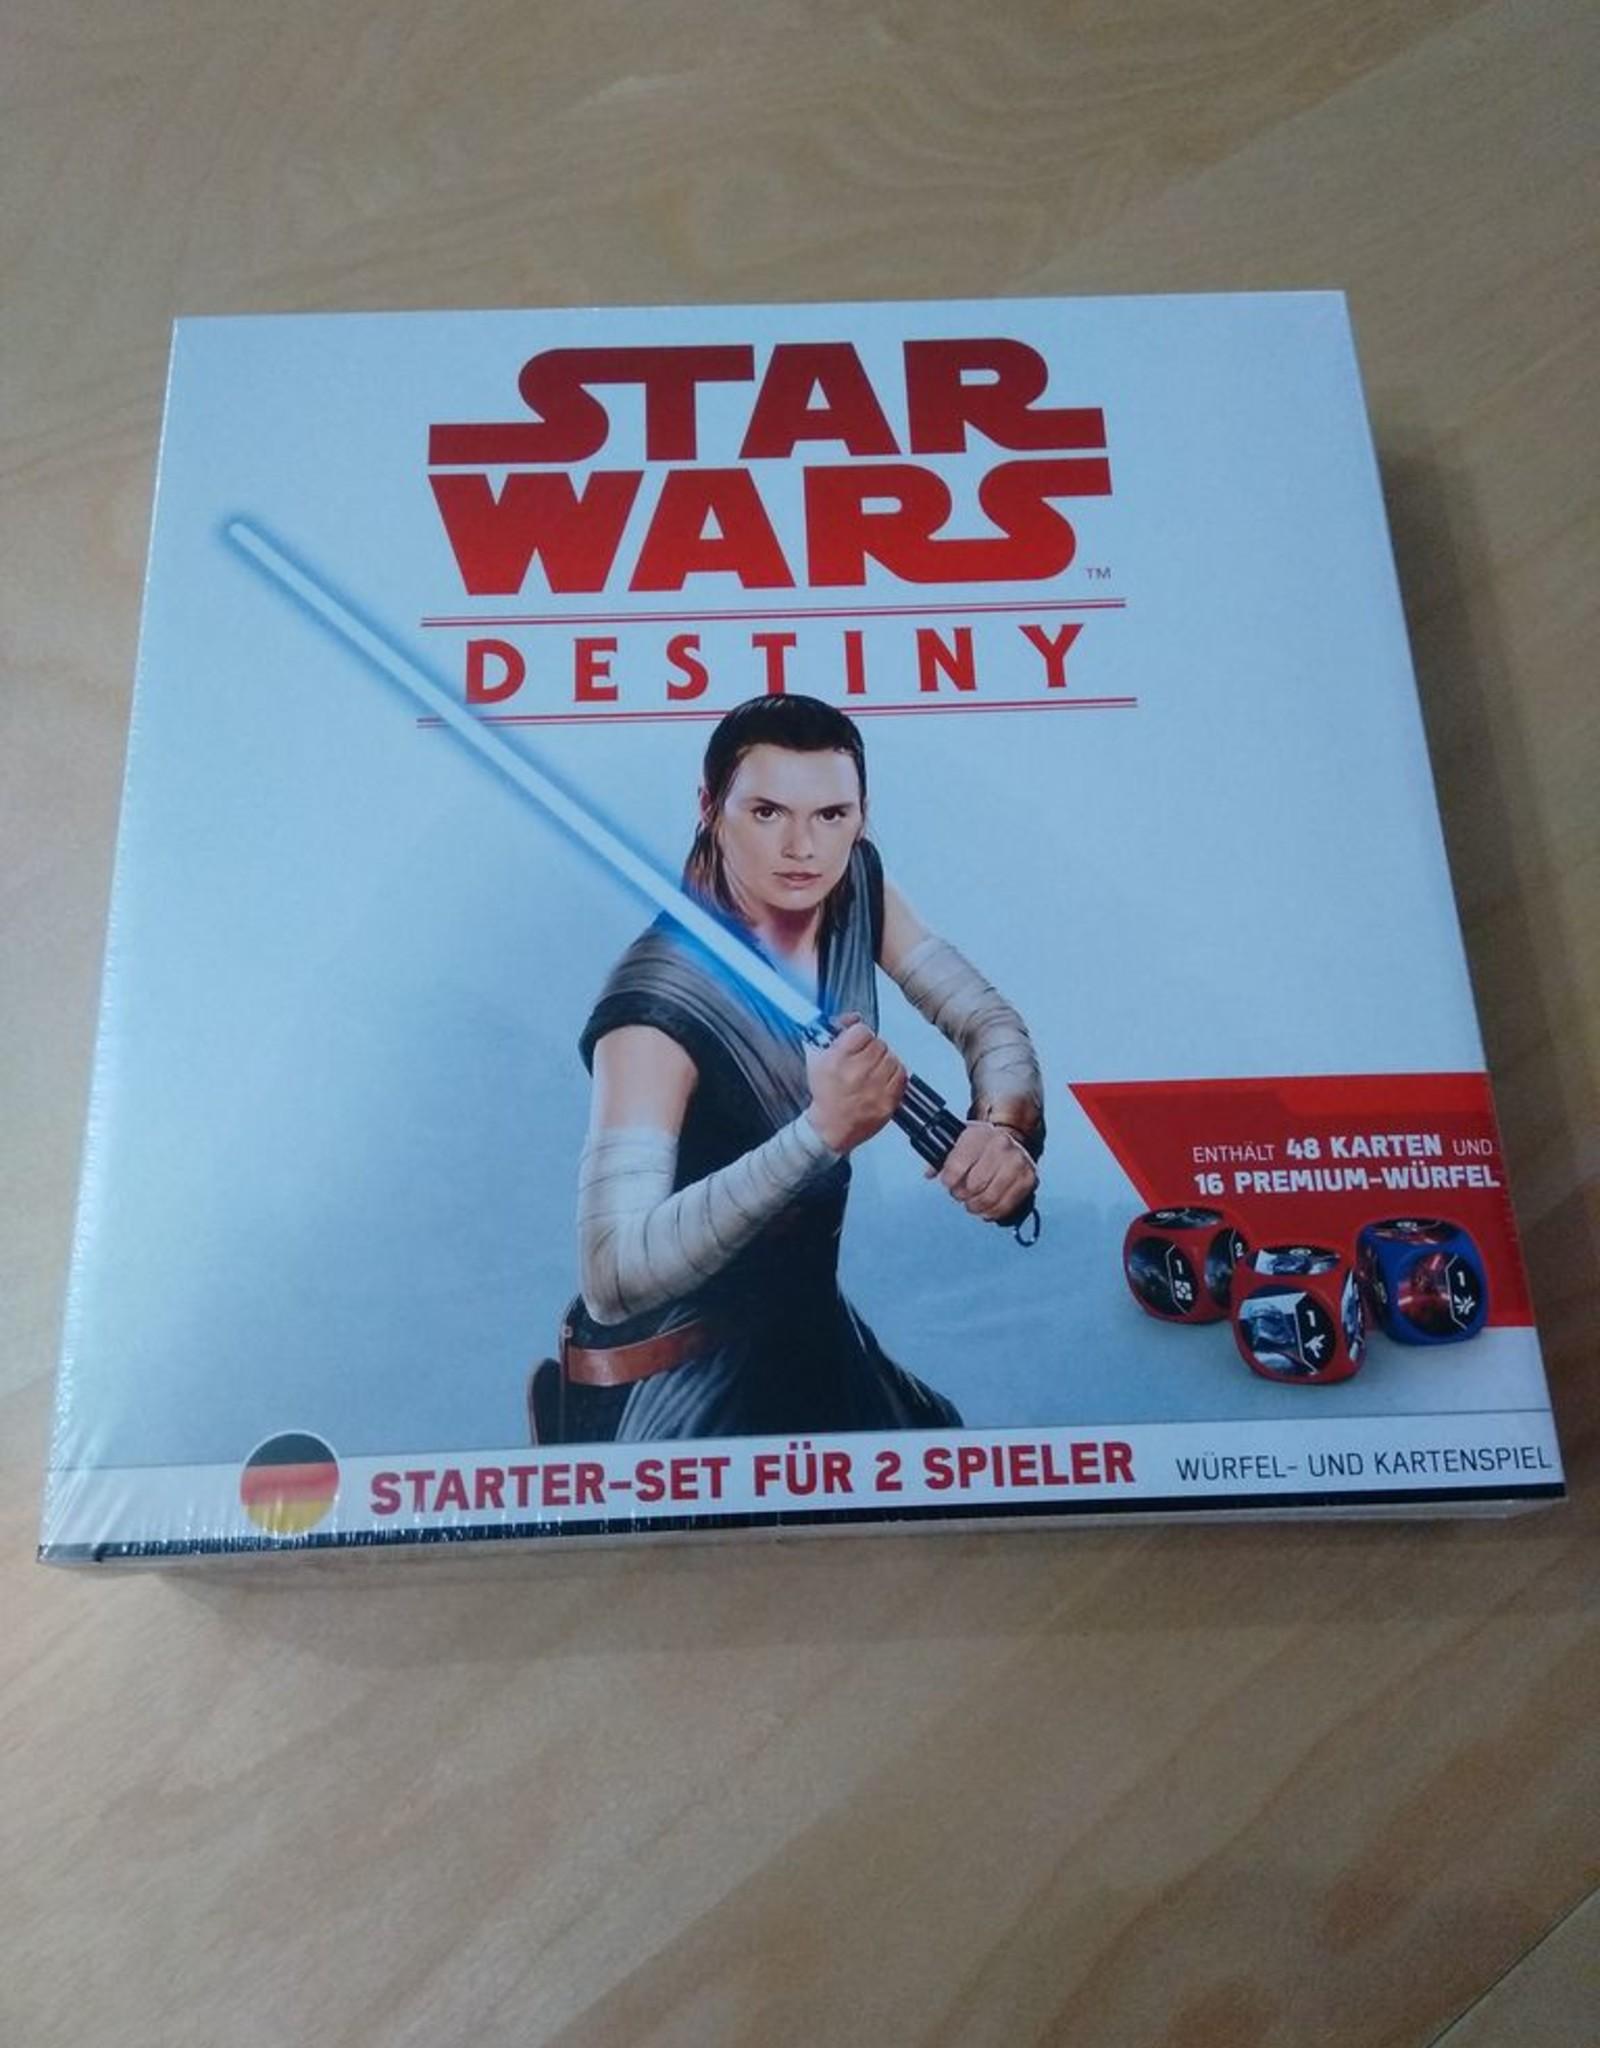 FFG - Star Wars Destiny FFG - Star Wars Destiny Starter-Set für 2 Personen - DE